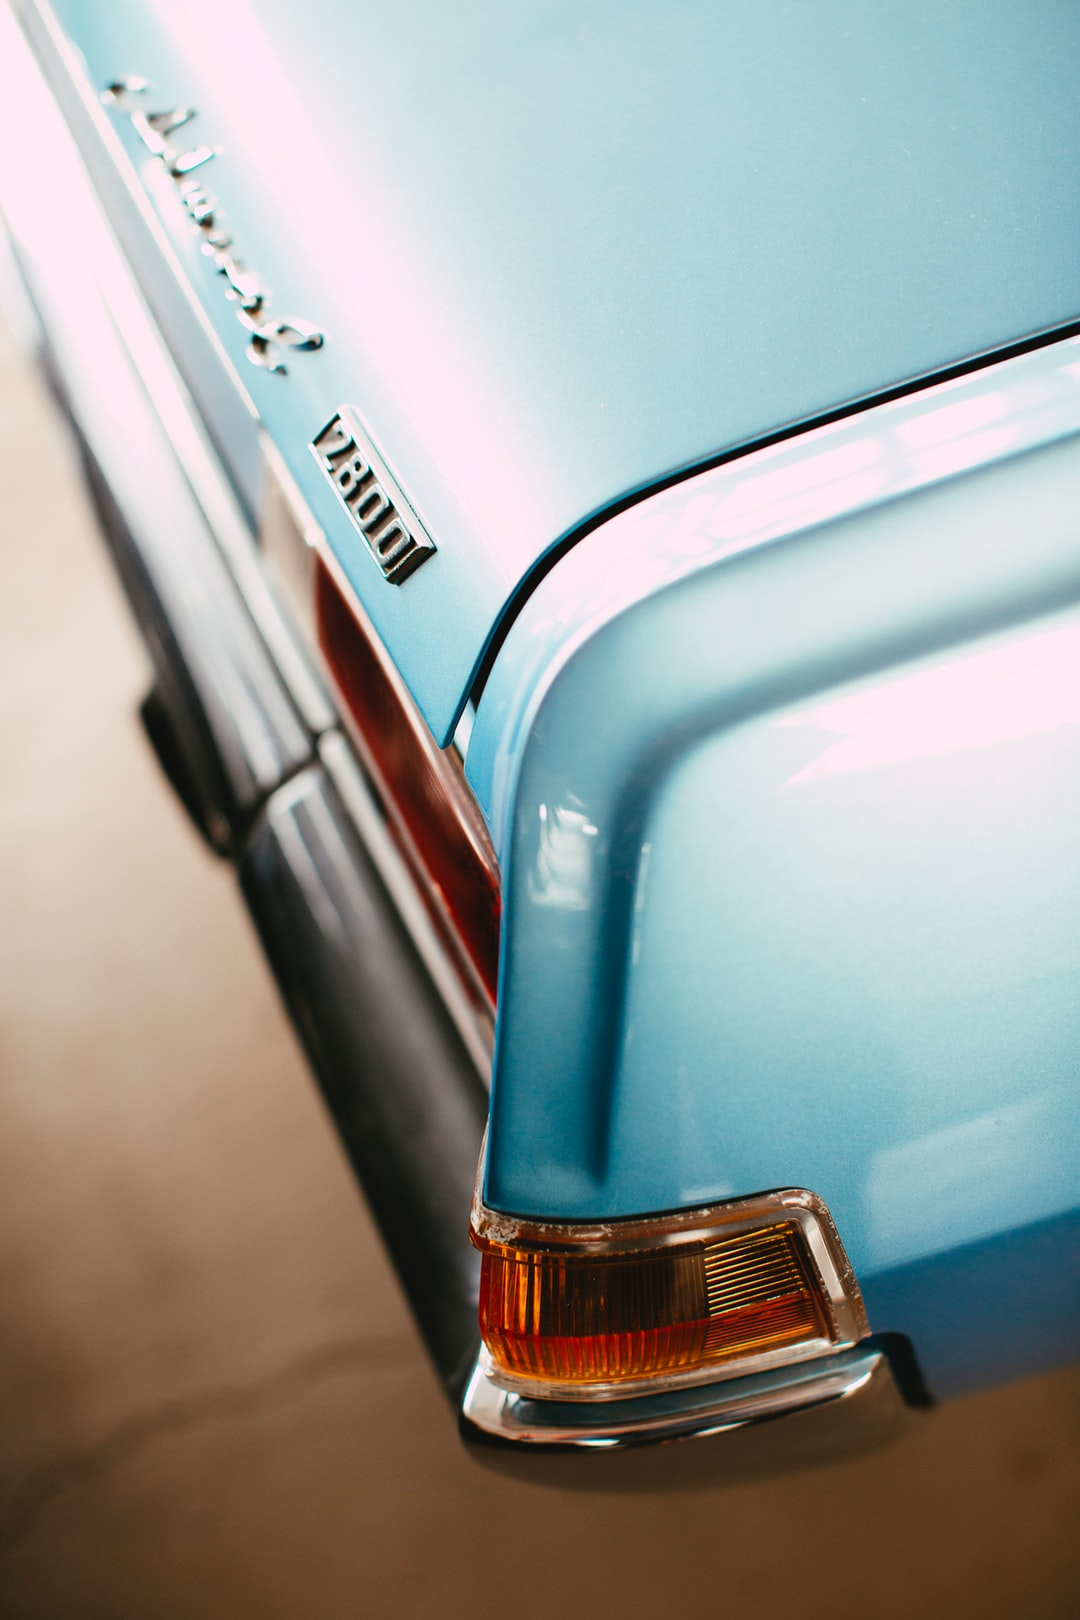 Classic oldtimer vintage car german engineering – Opel Diplomat Admiral B 2800 S rear tail light